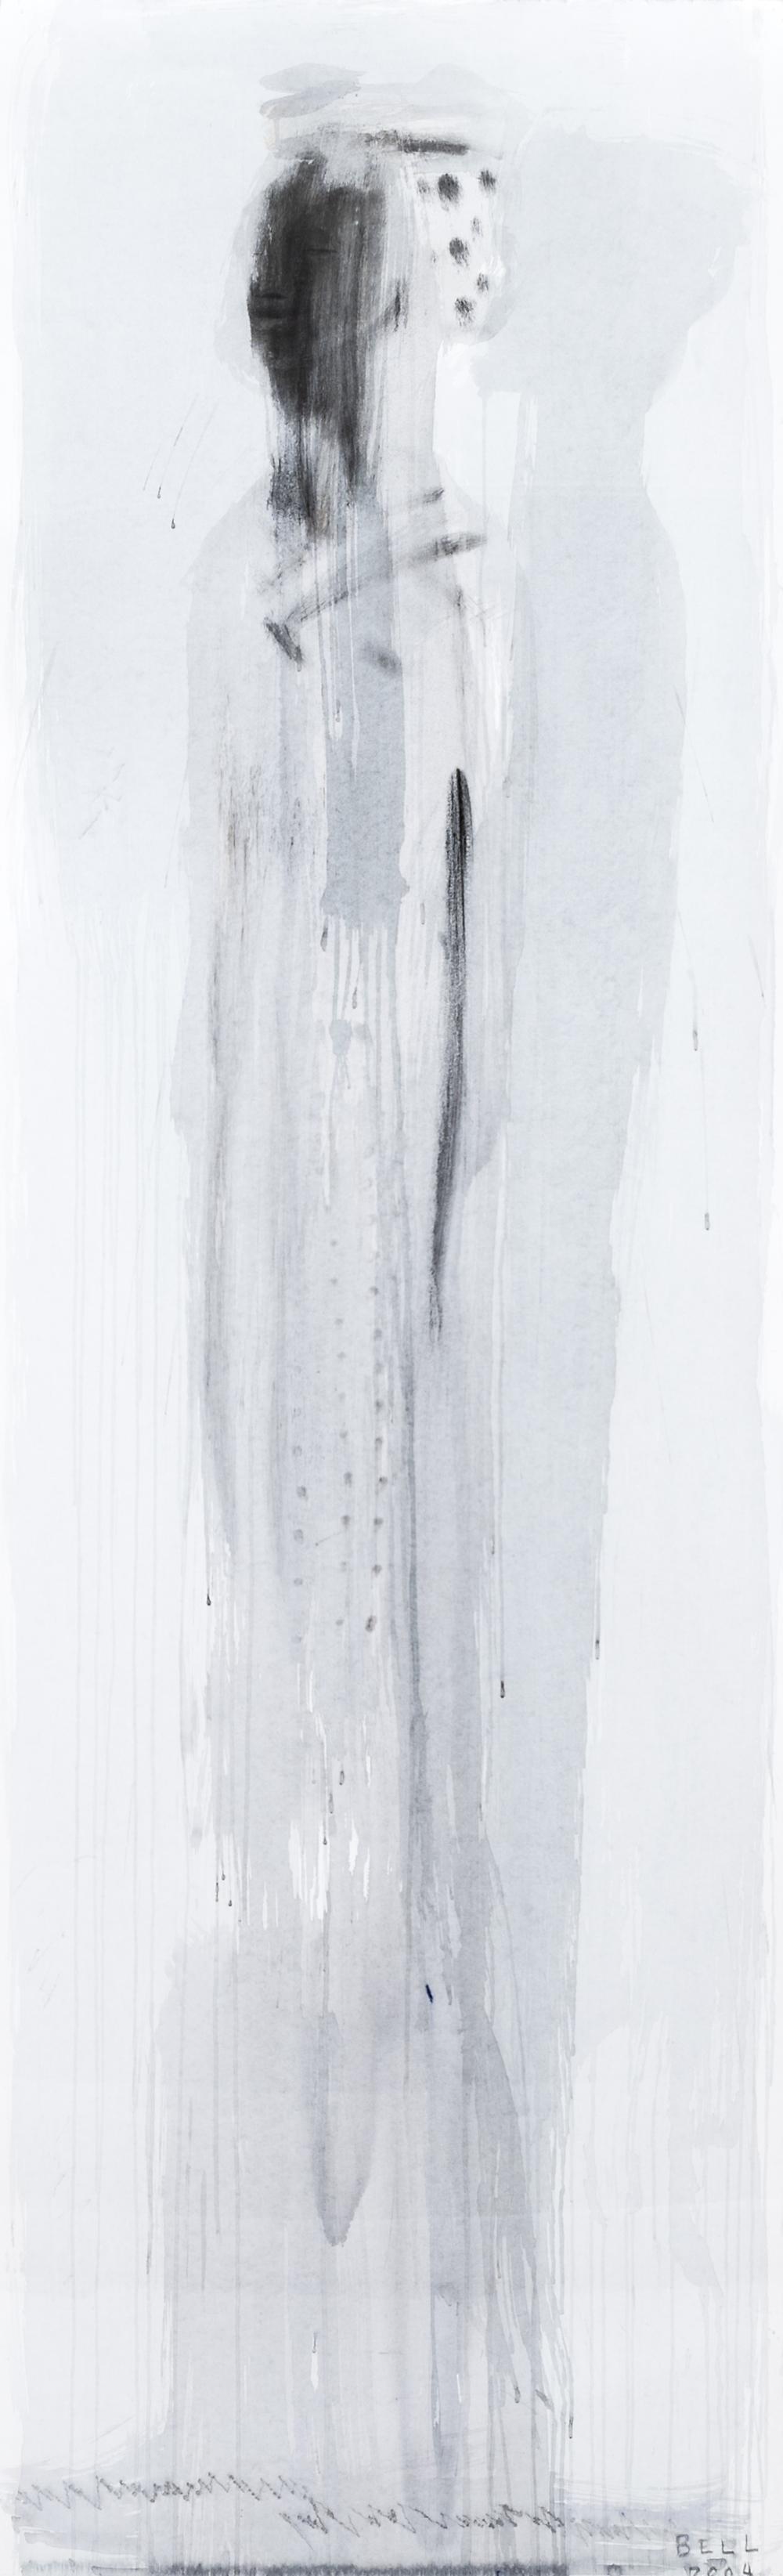 Deborah Bell, Sentinel